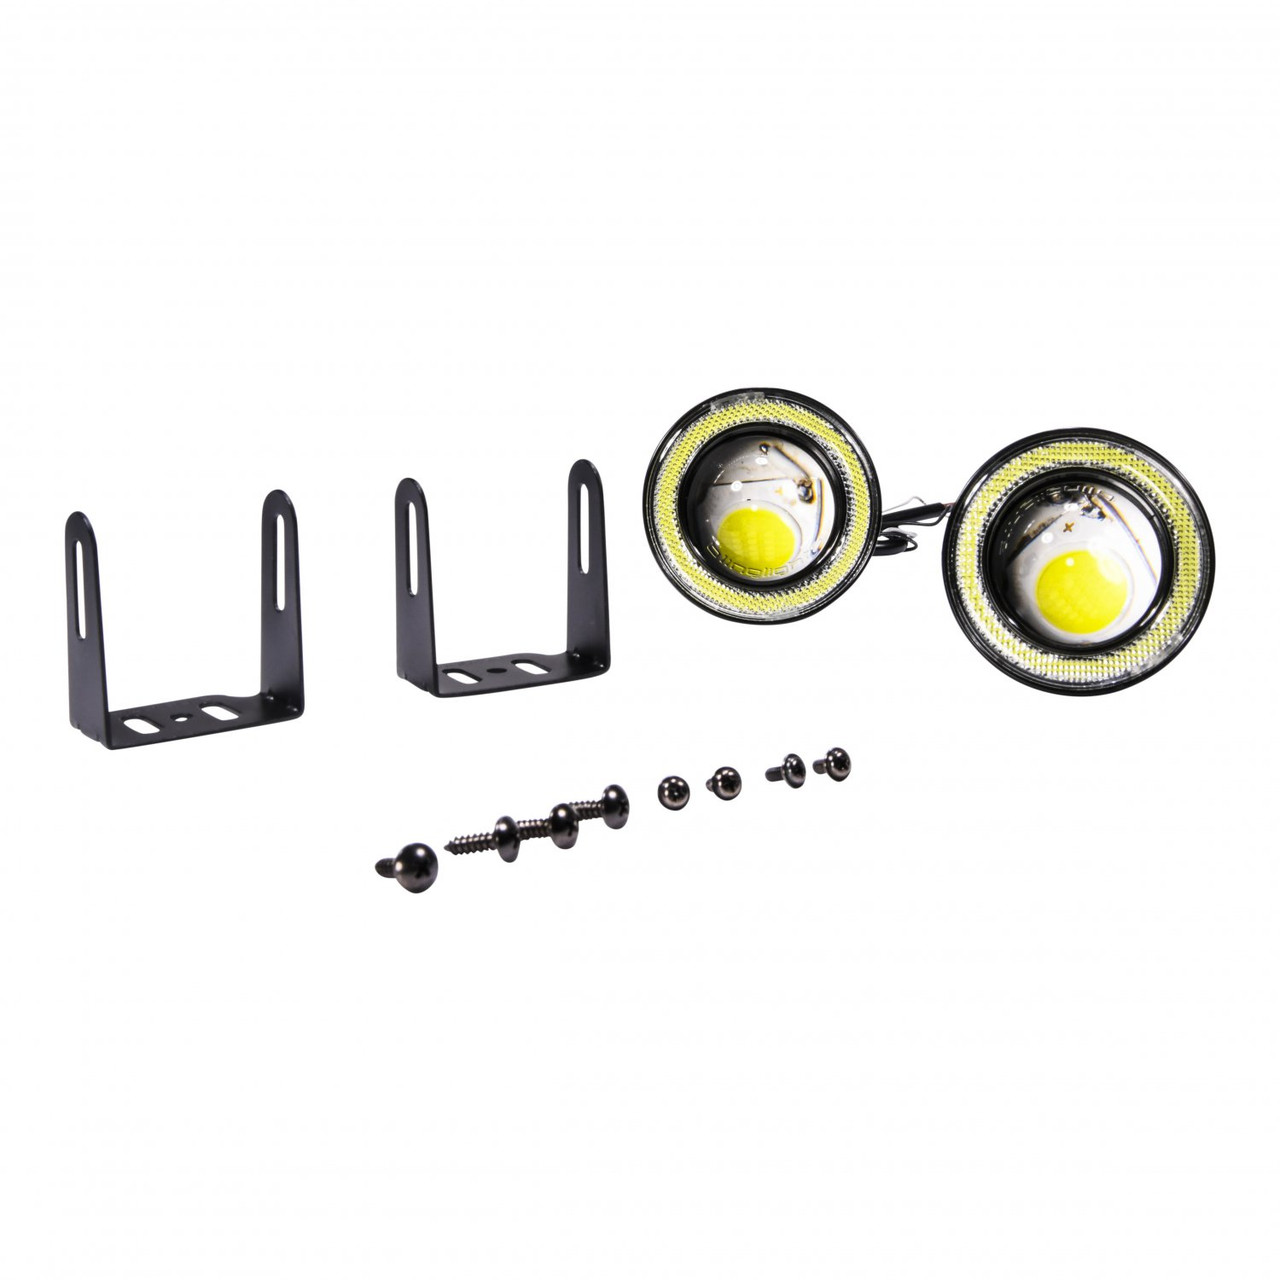 LED Halo Foglamp Drivinglight Kit For 2014 2015 BMW F45 2 Series Active Tourer